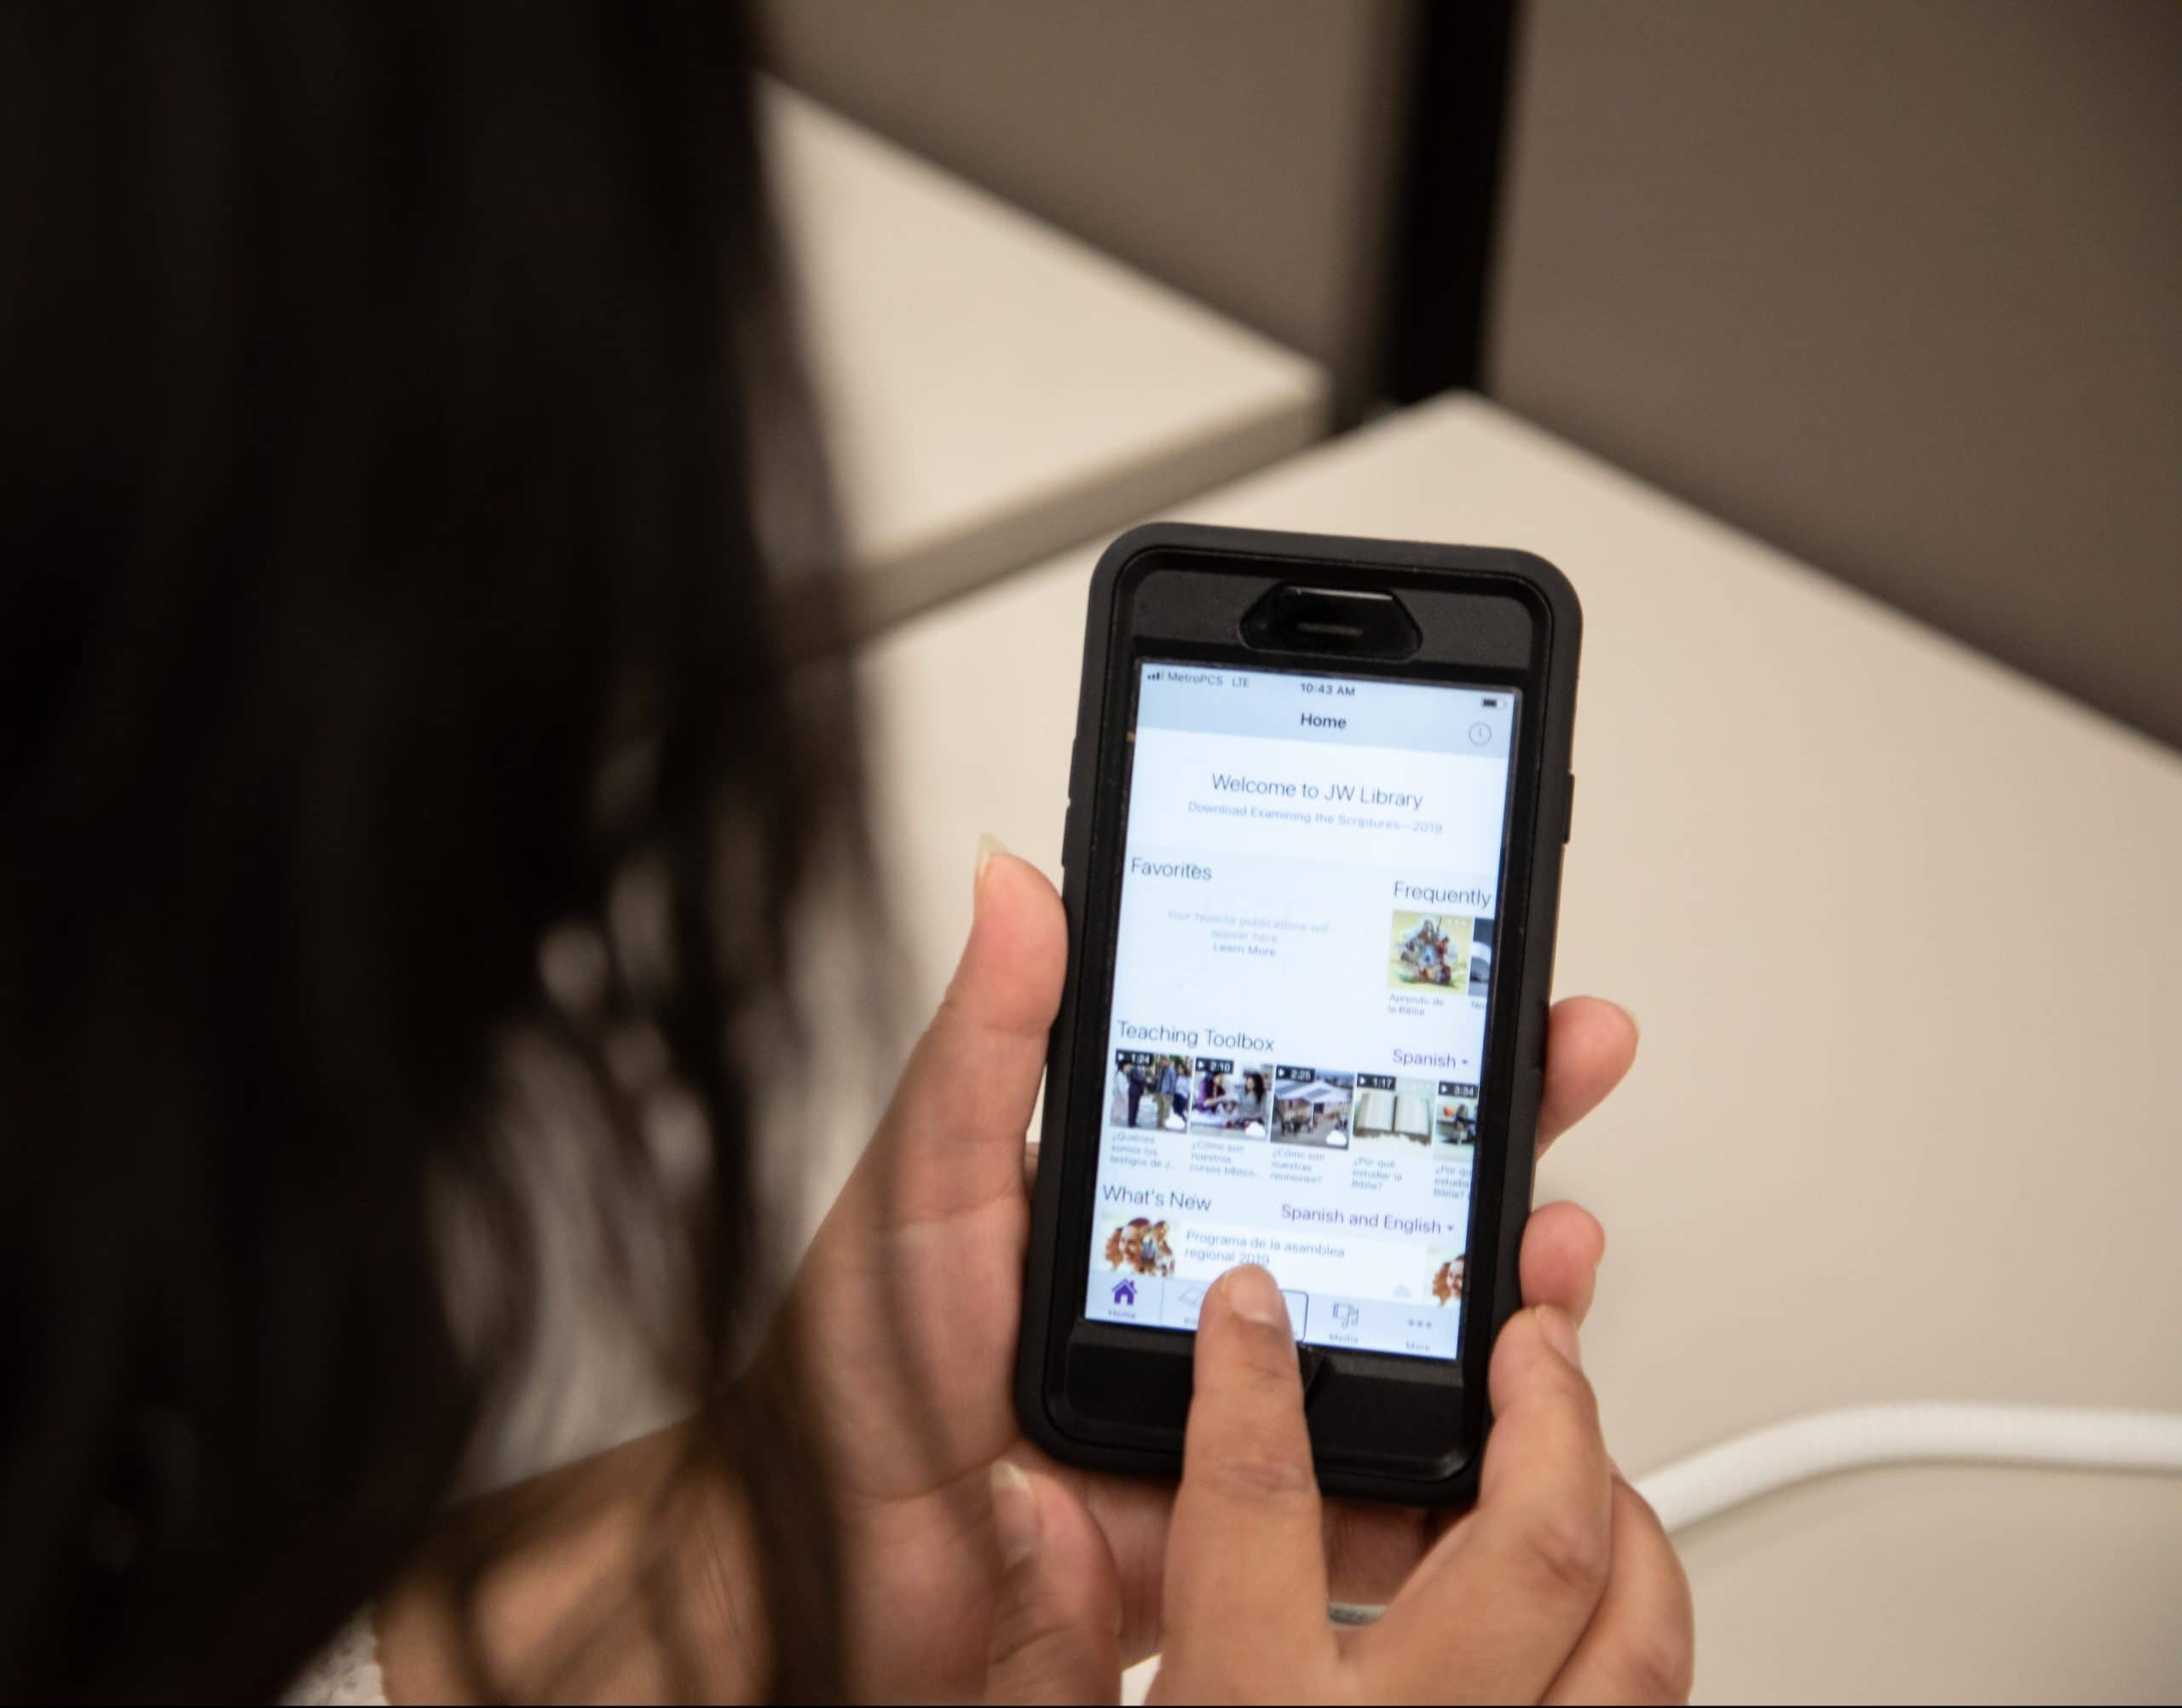 Student scrolls through BARD app on smart phone